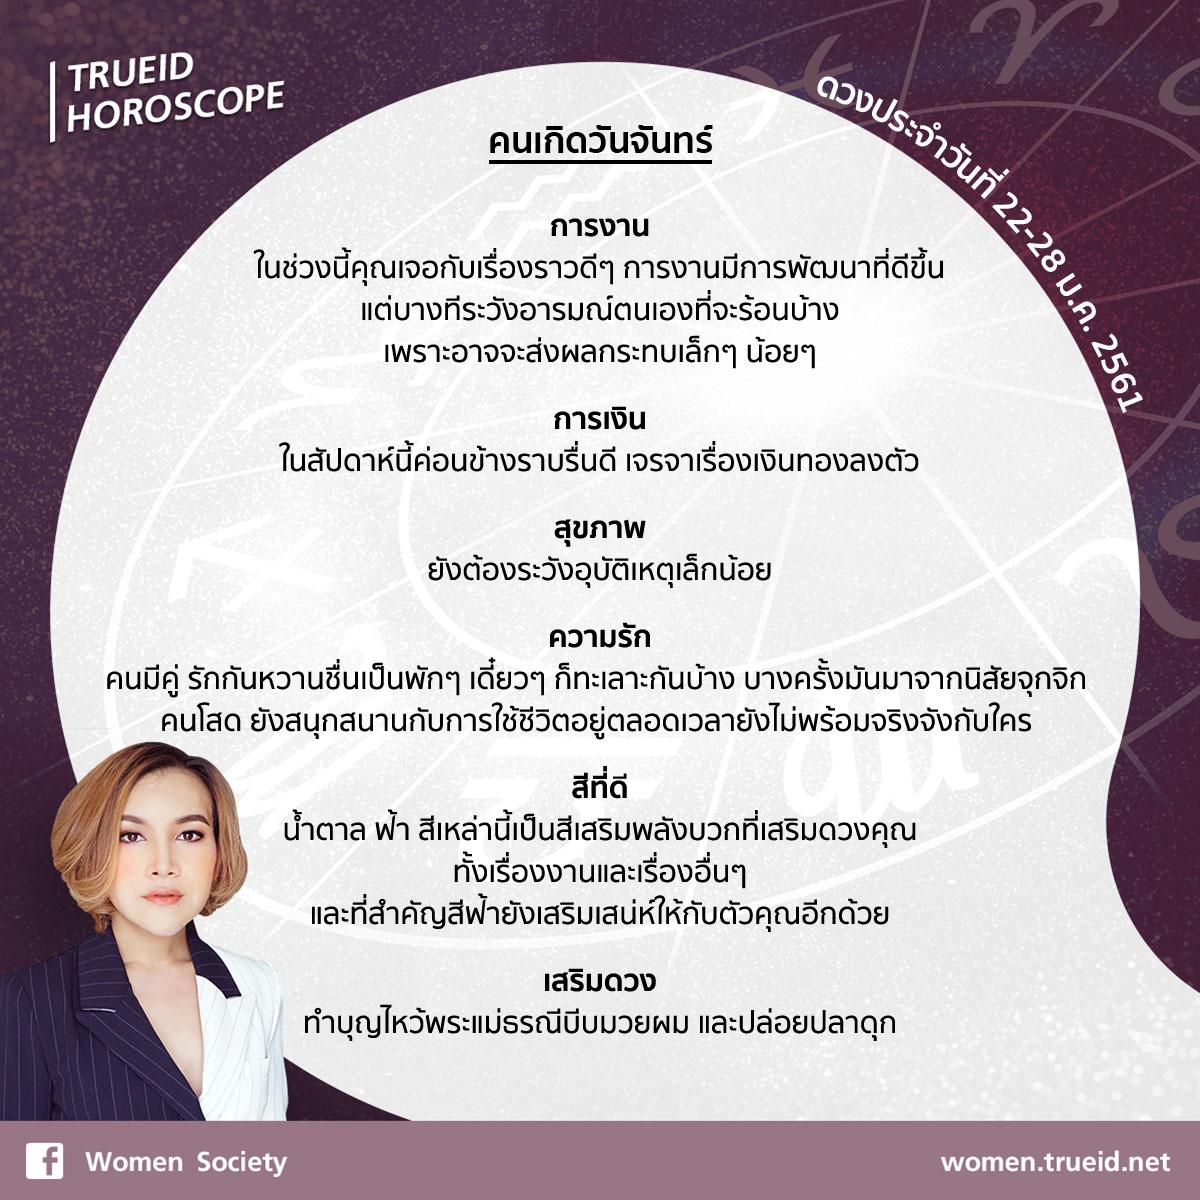 TrueID Horoscope : ดูดวง รายสัปดาห์ แม่นๆ 22-28 ม.ค. 61 โดย หมอดู Toktak A4